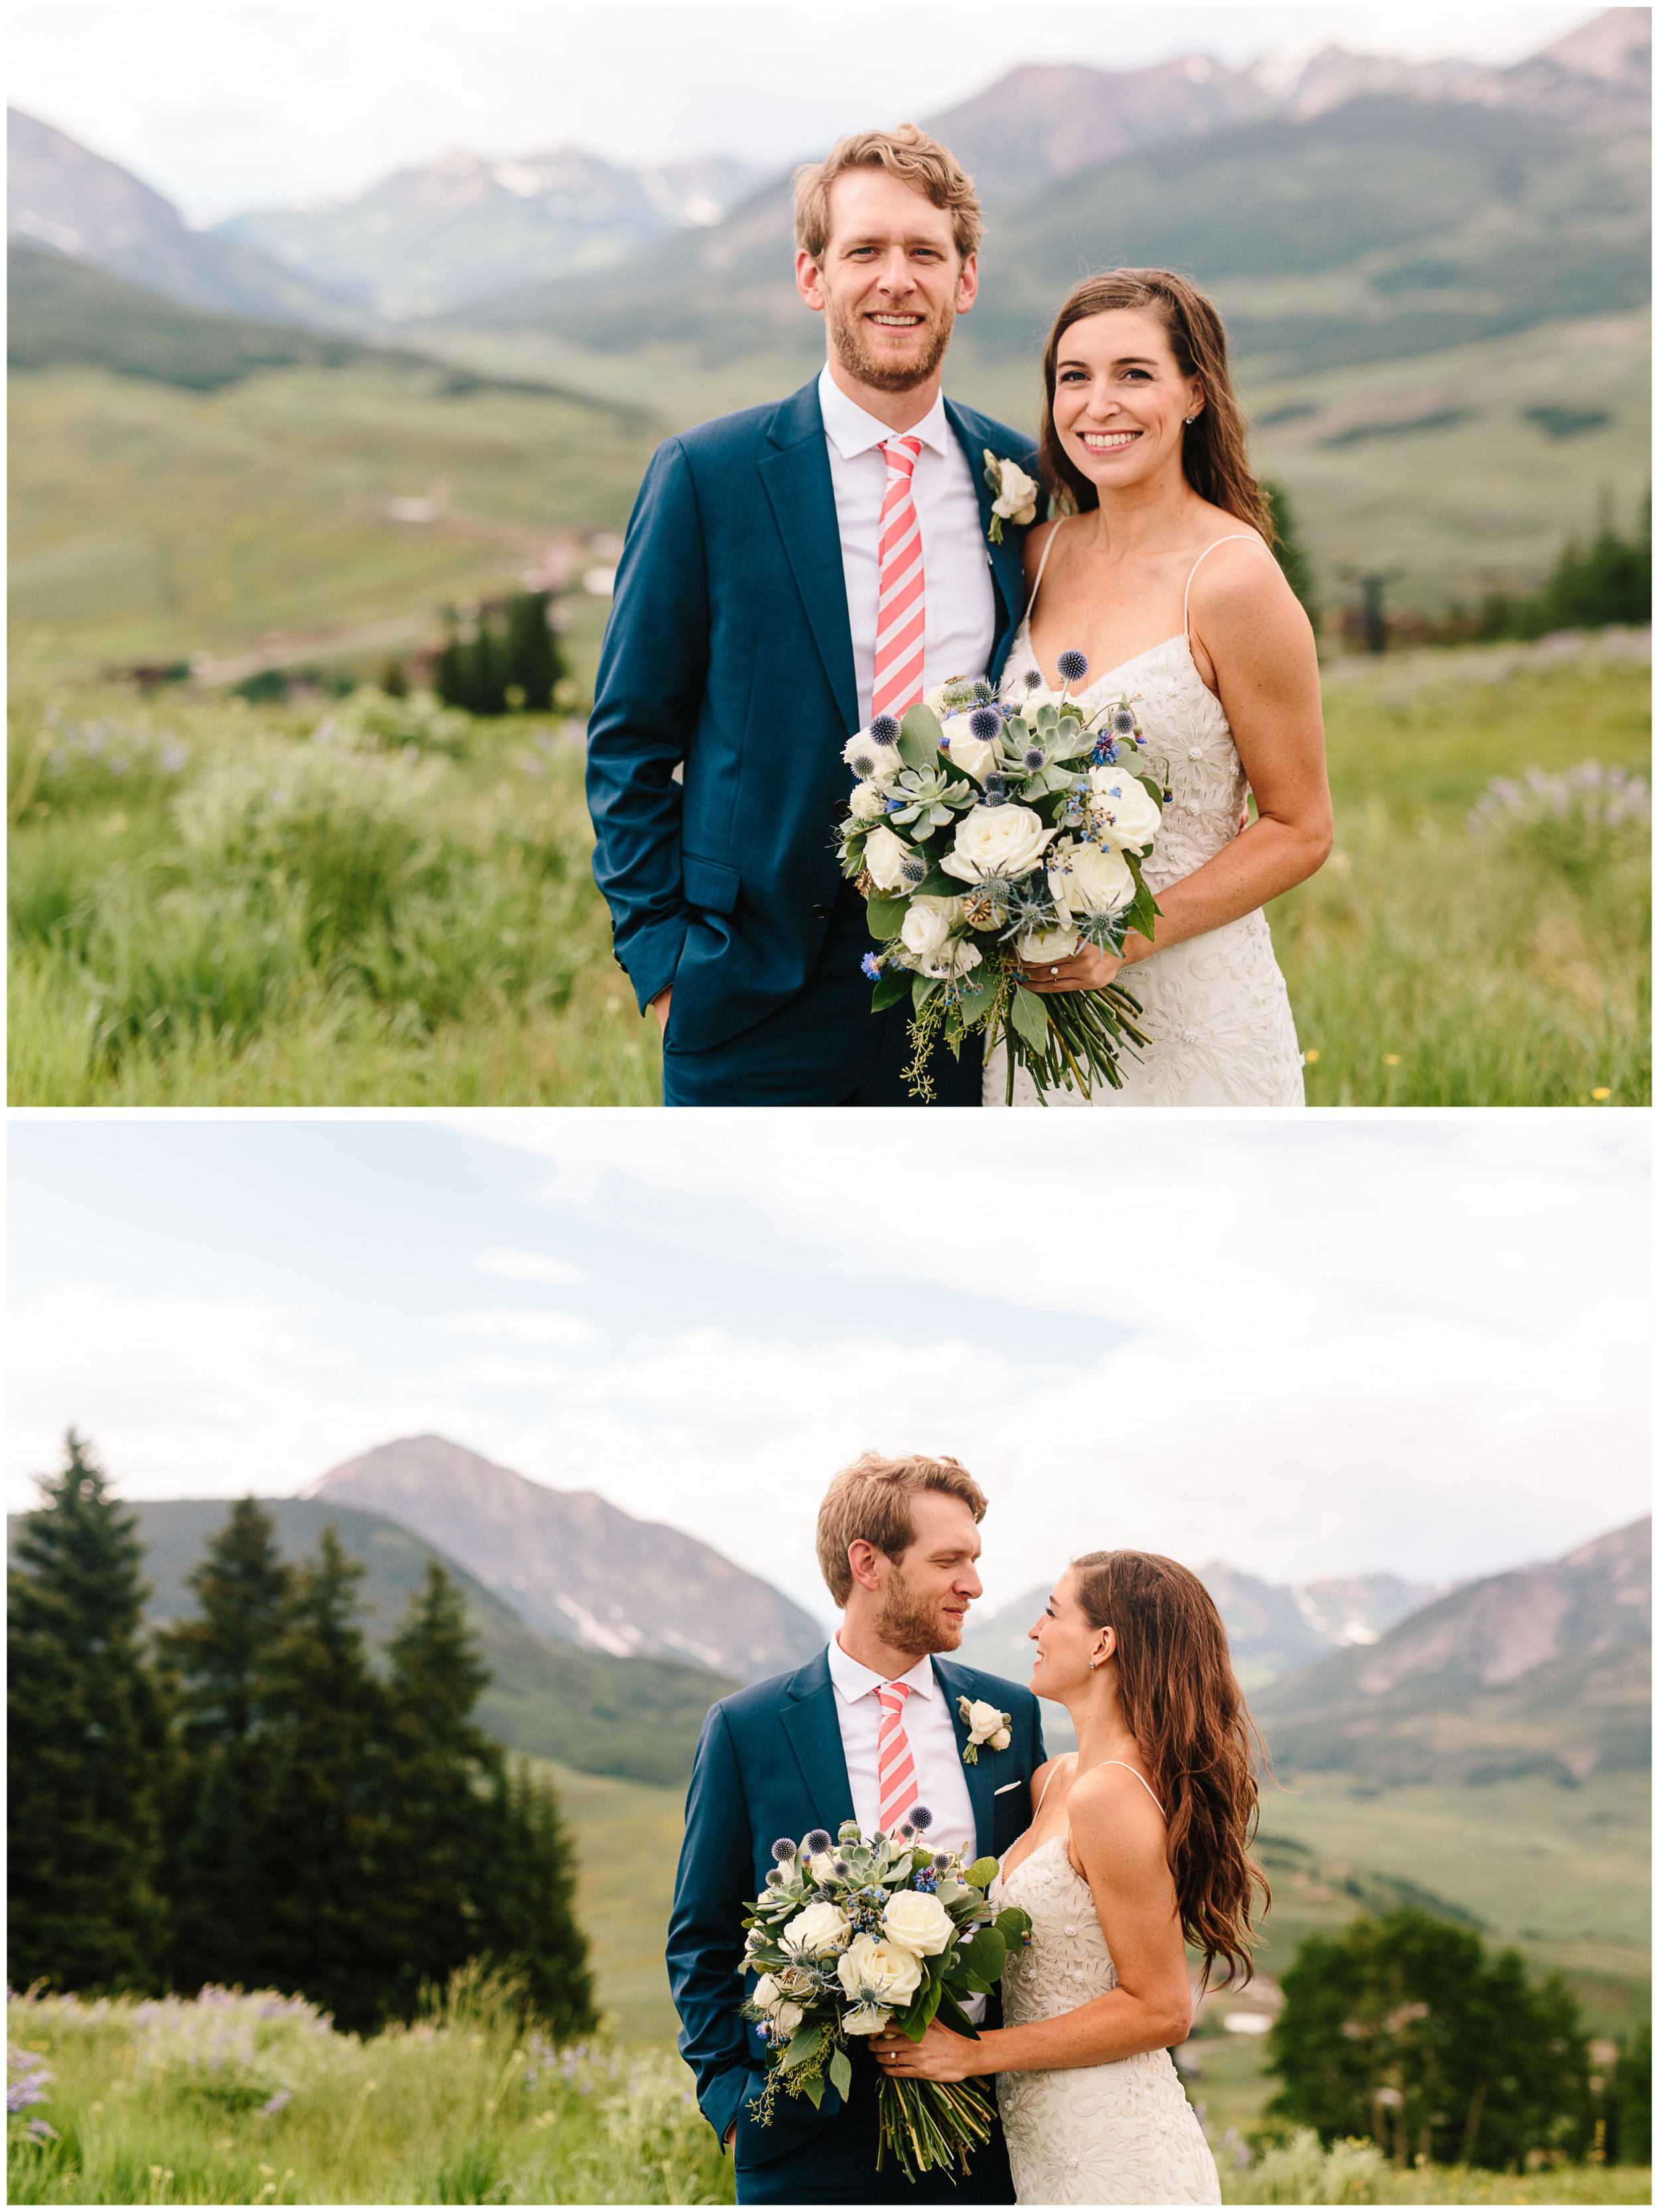 crested_butte_wedding_57.jpg